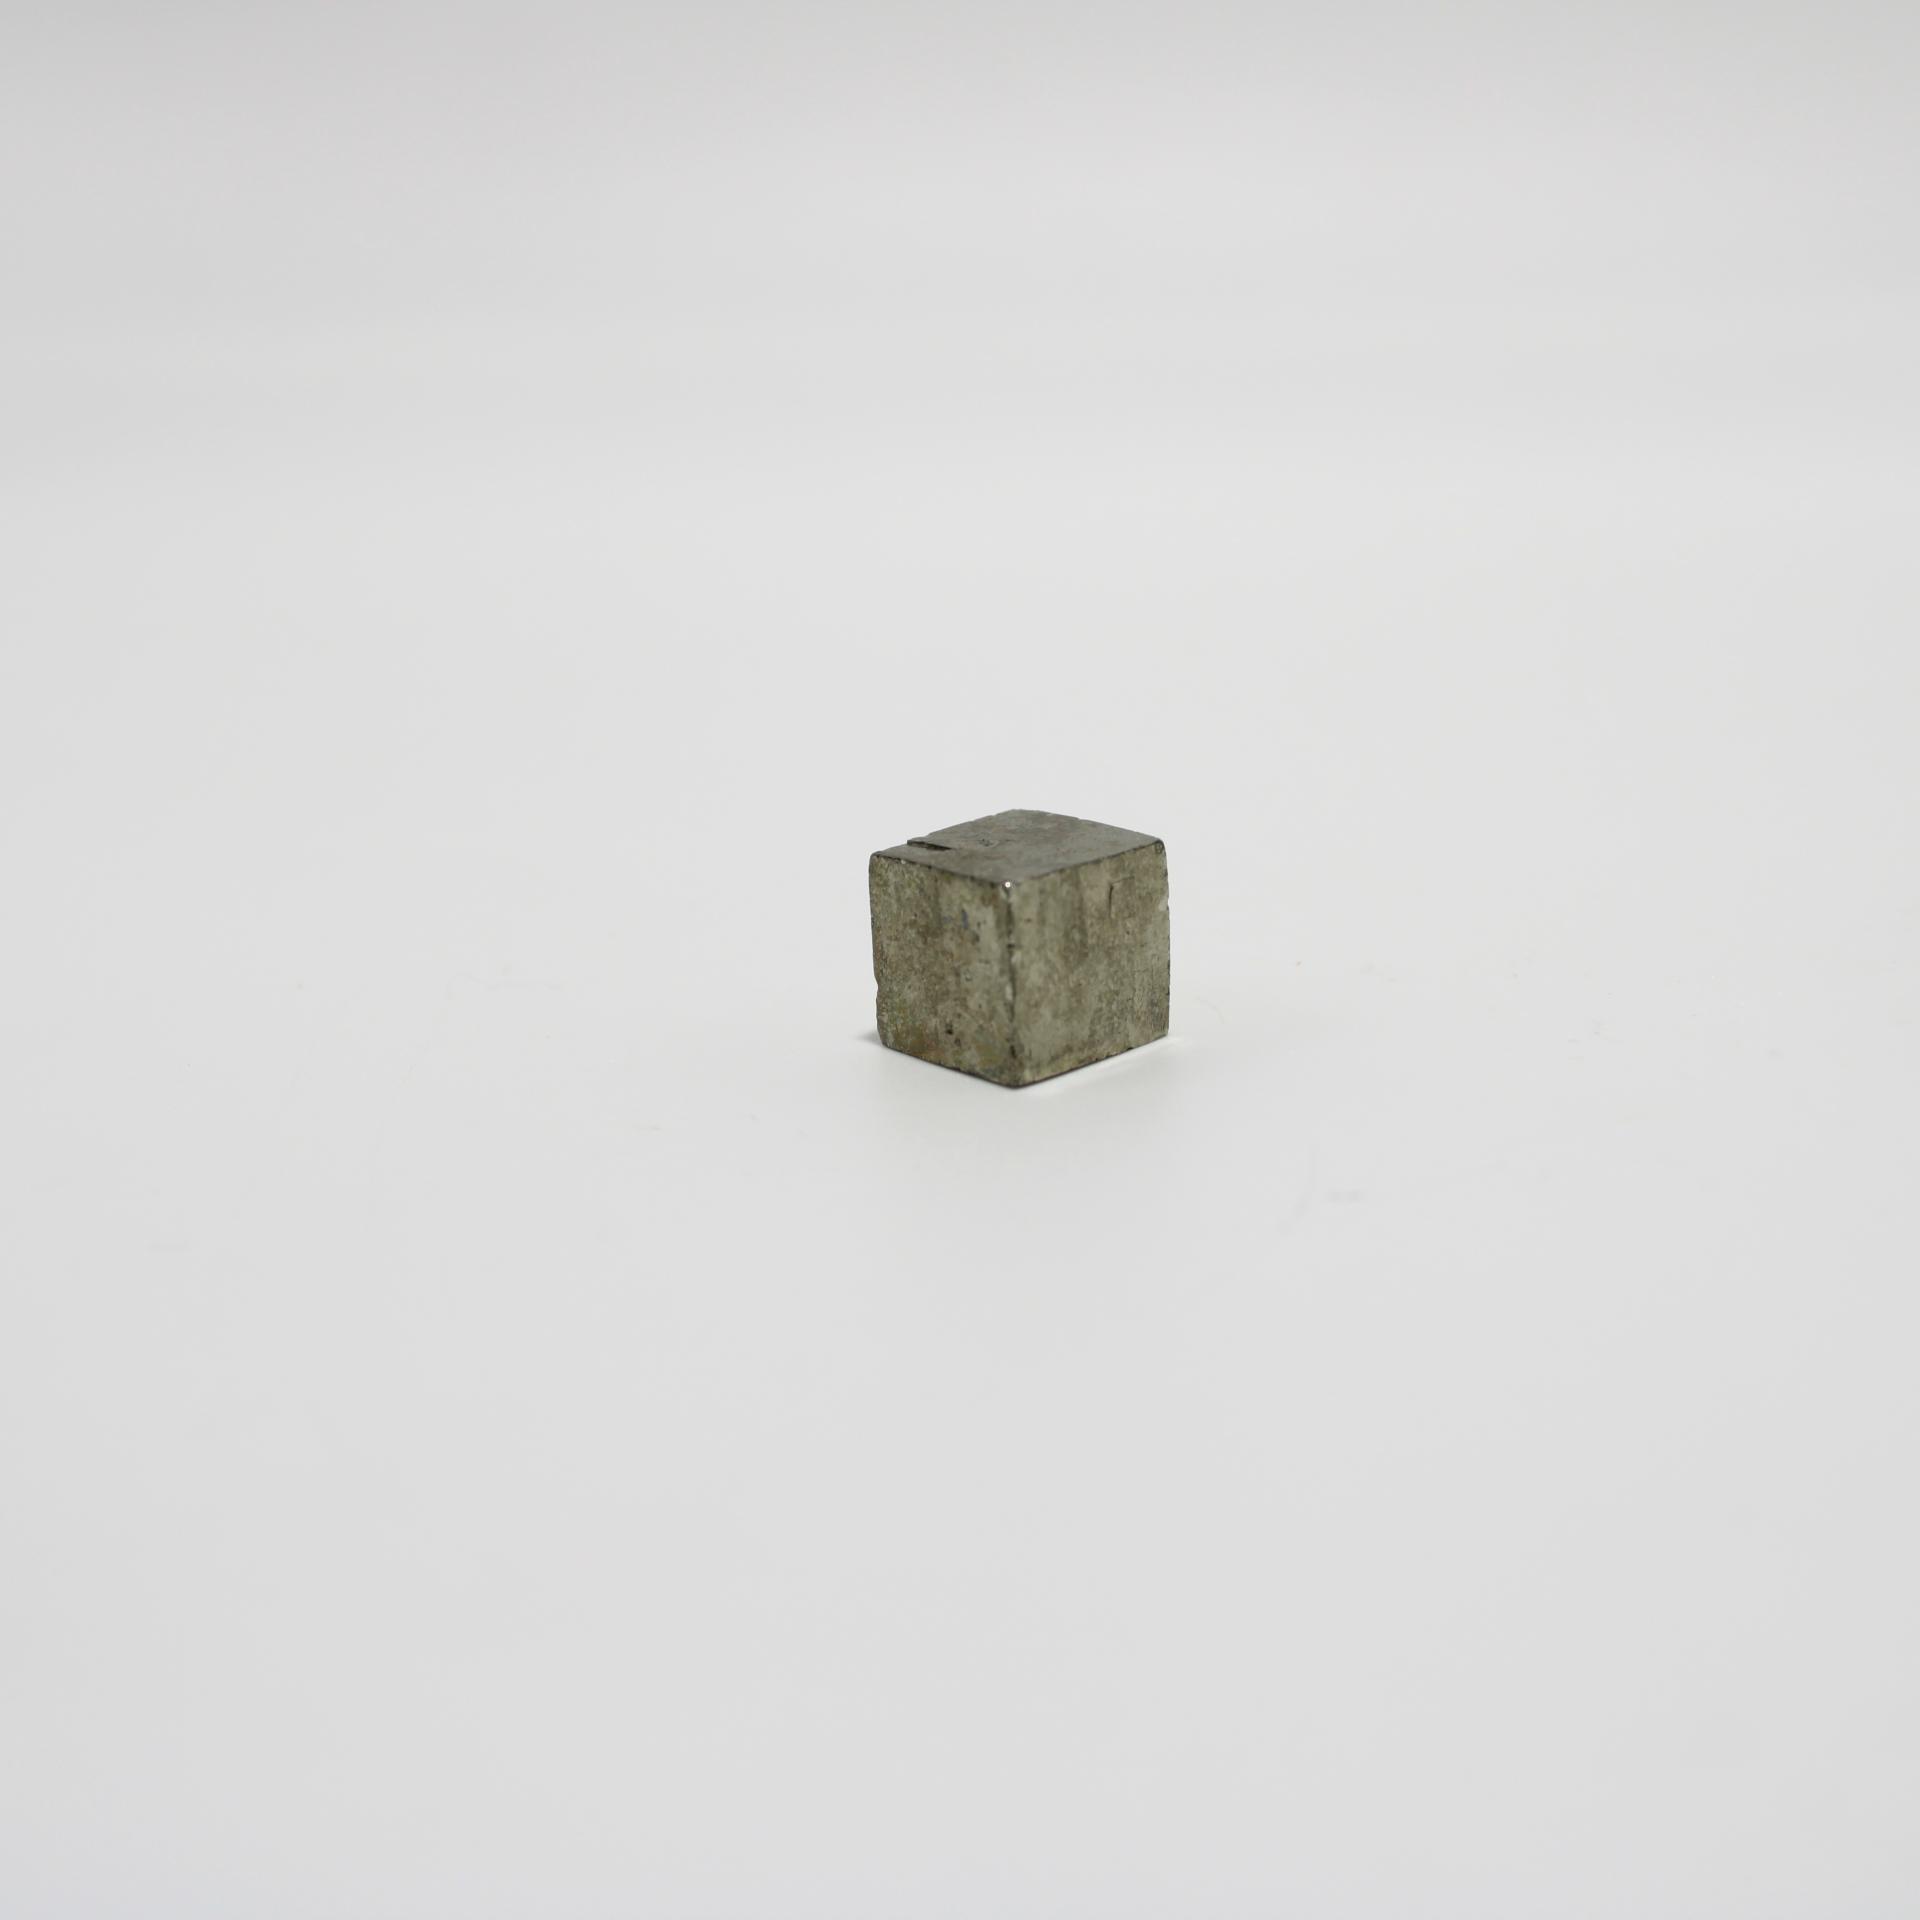 I74 pyritecube 1